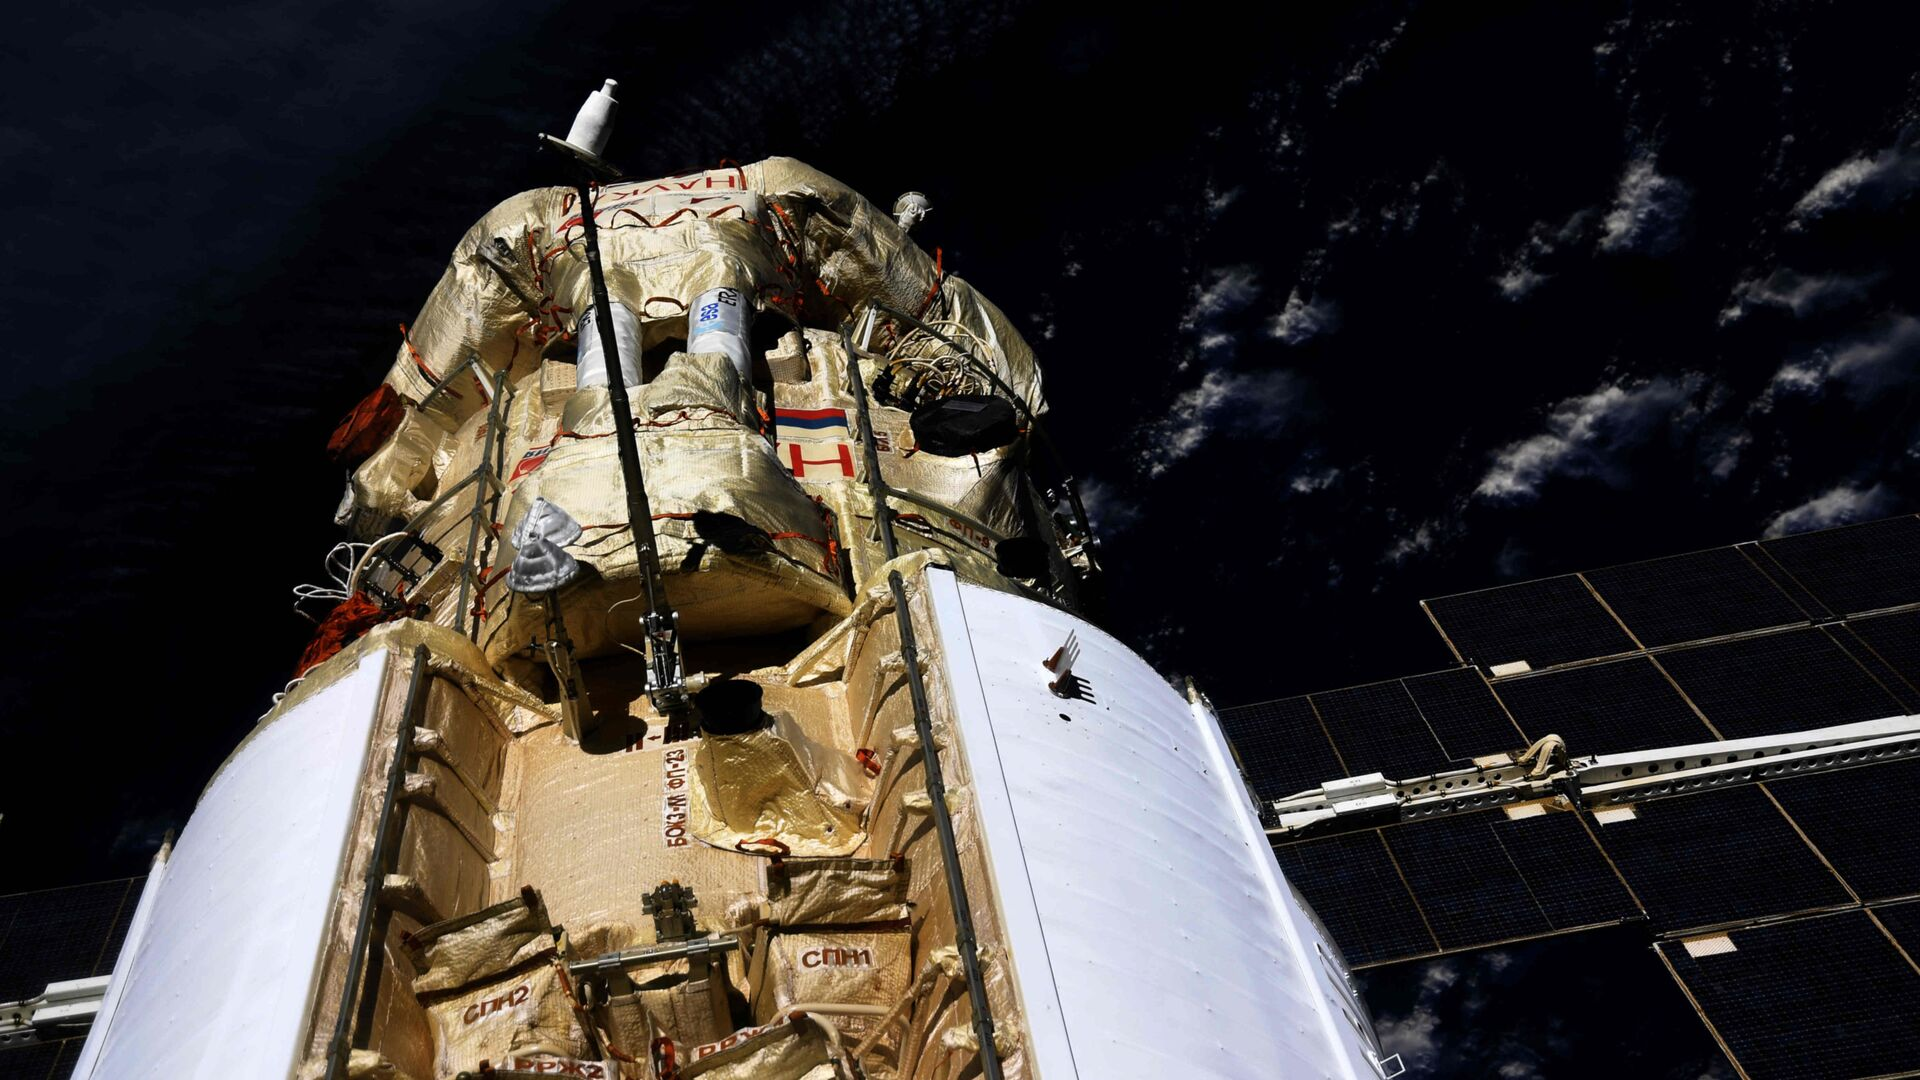 Il modulo Nauka sulla ISS - Sputnik Italia, 1920, 30.07.2021